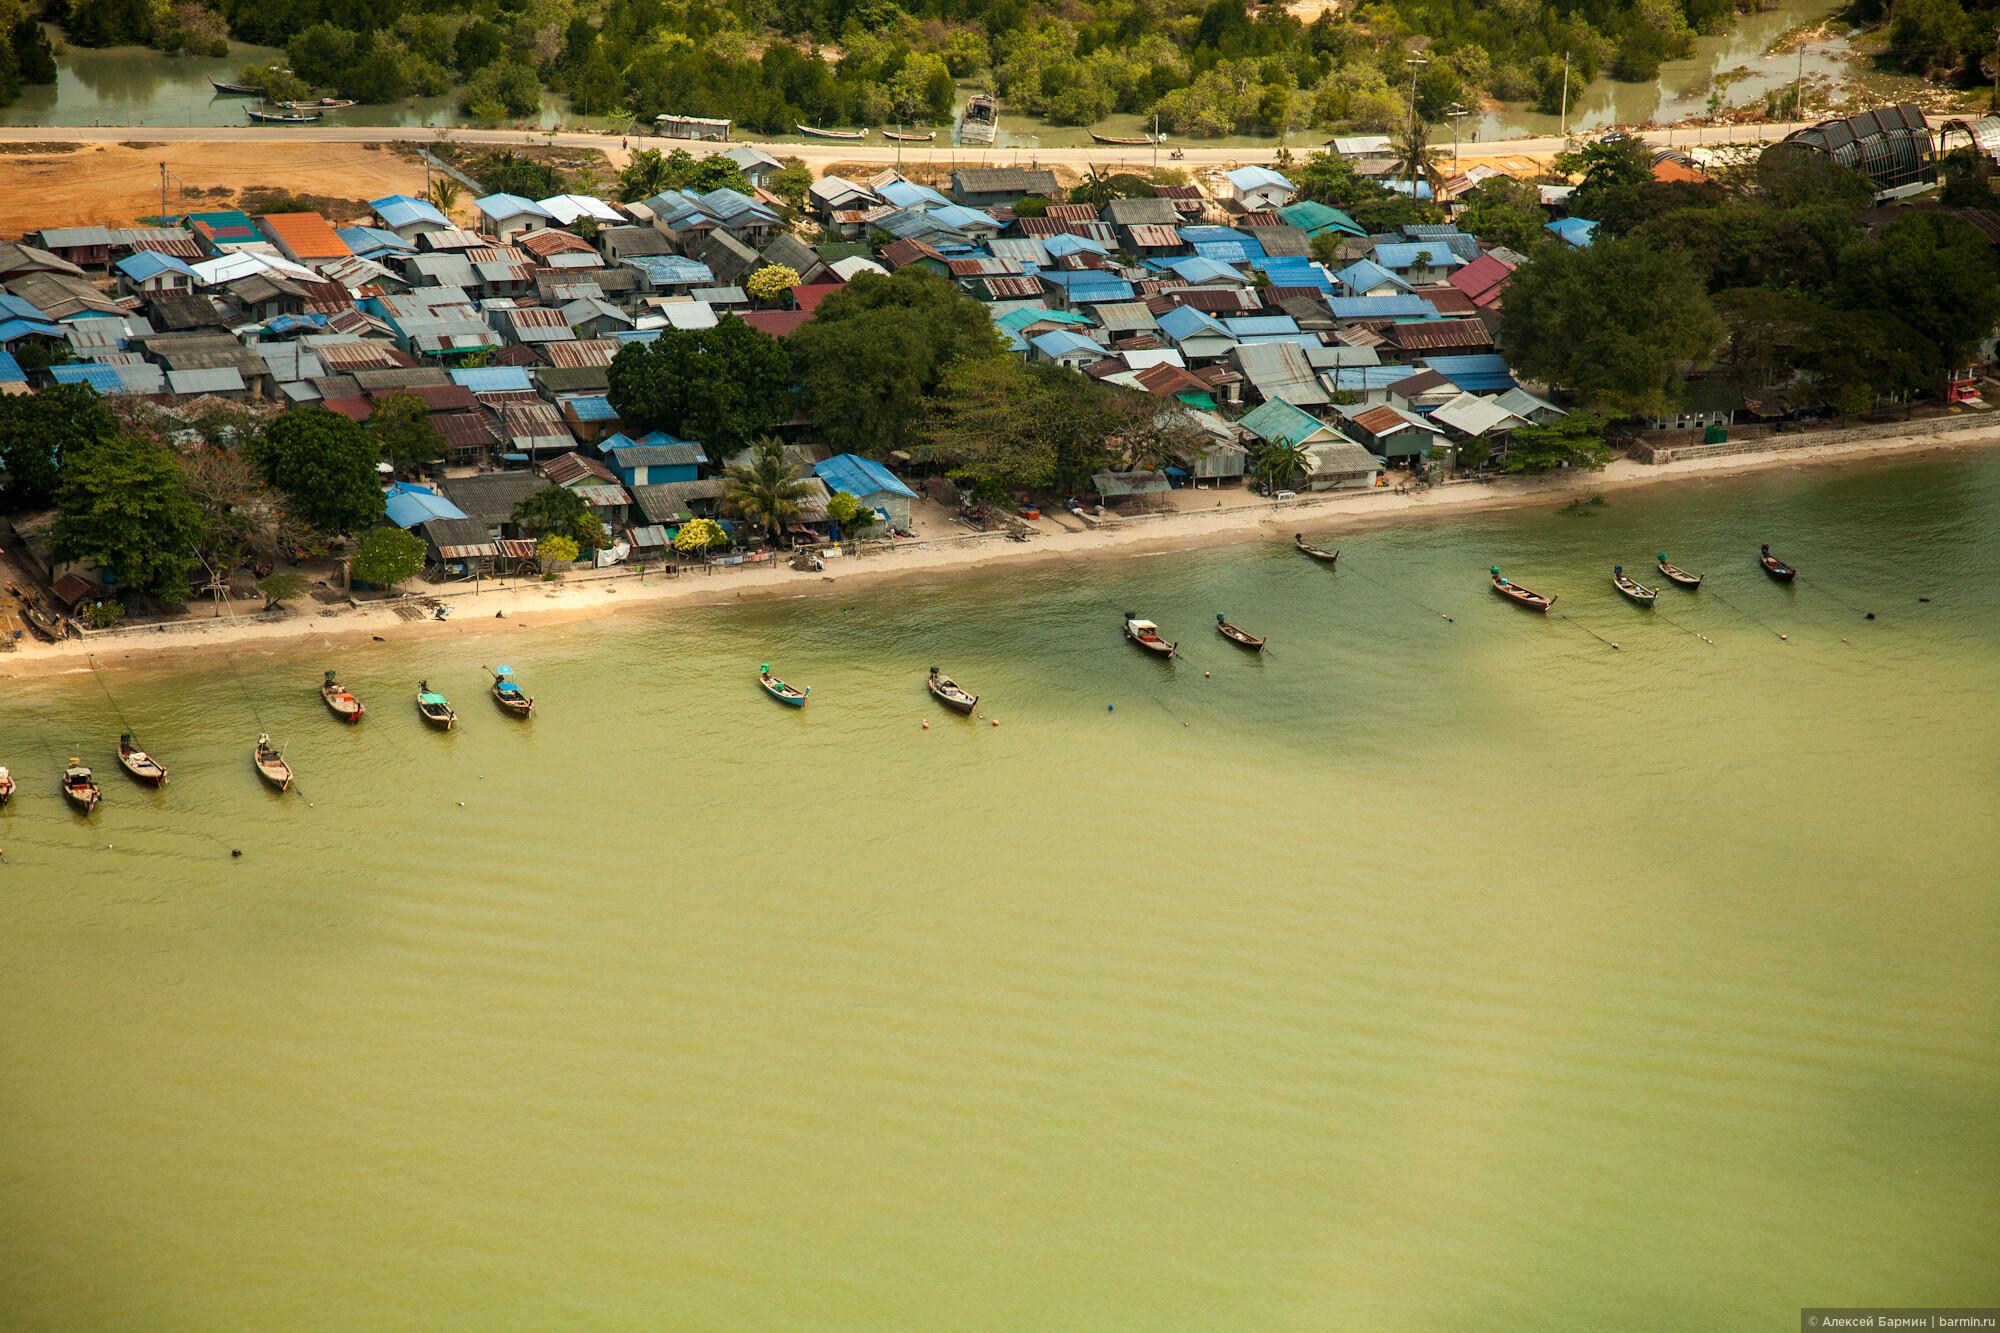 "Фото из альбома ""Полет на вертолете"", Таиланд"